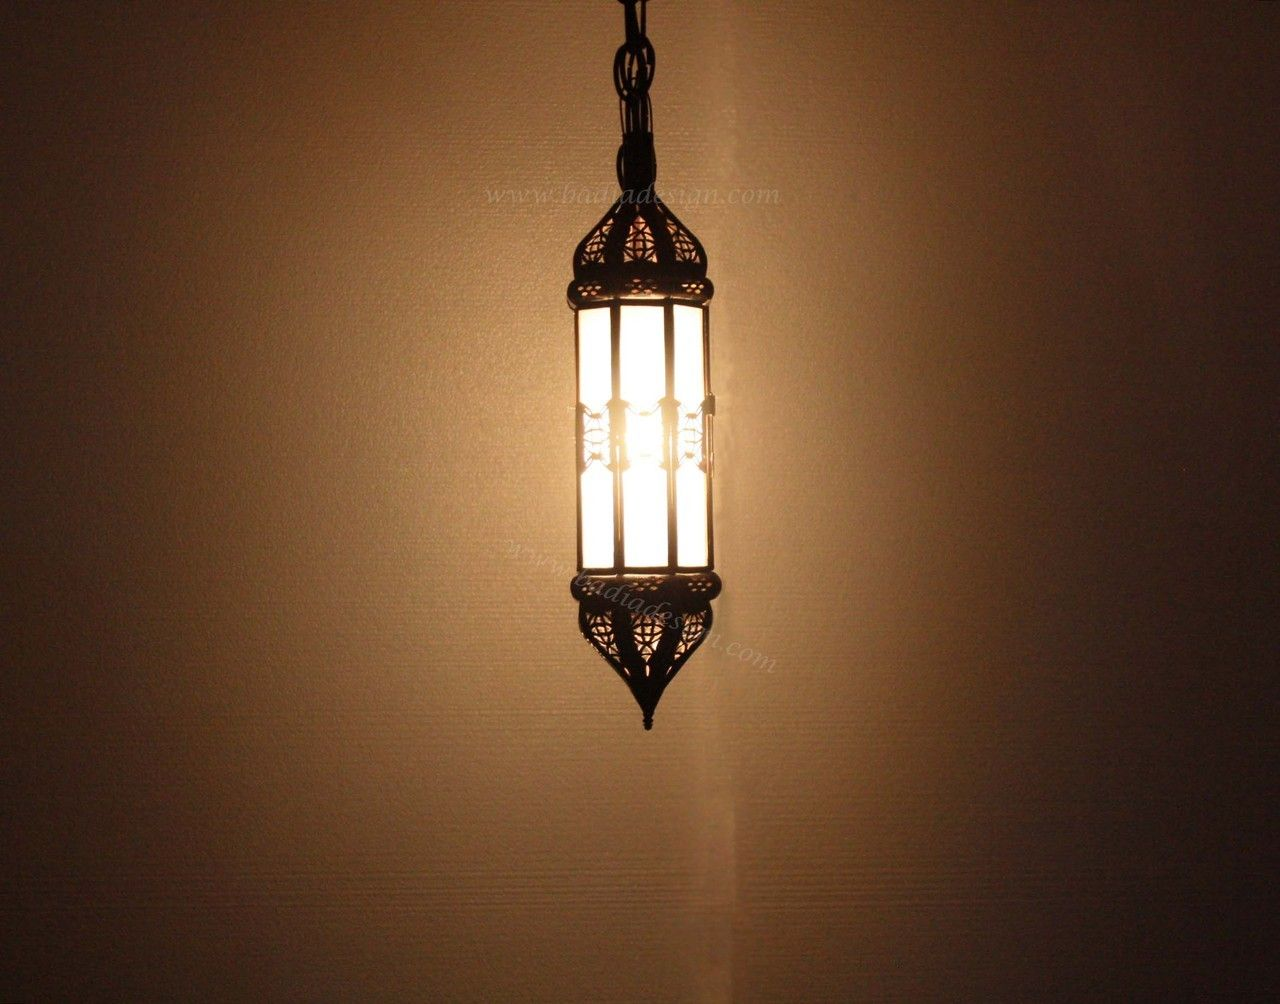 Badia Design Inc Store   Cylinder Shaped Hanging Lantern With White Glass    LIG178, $114.00 Design Inspirations